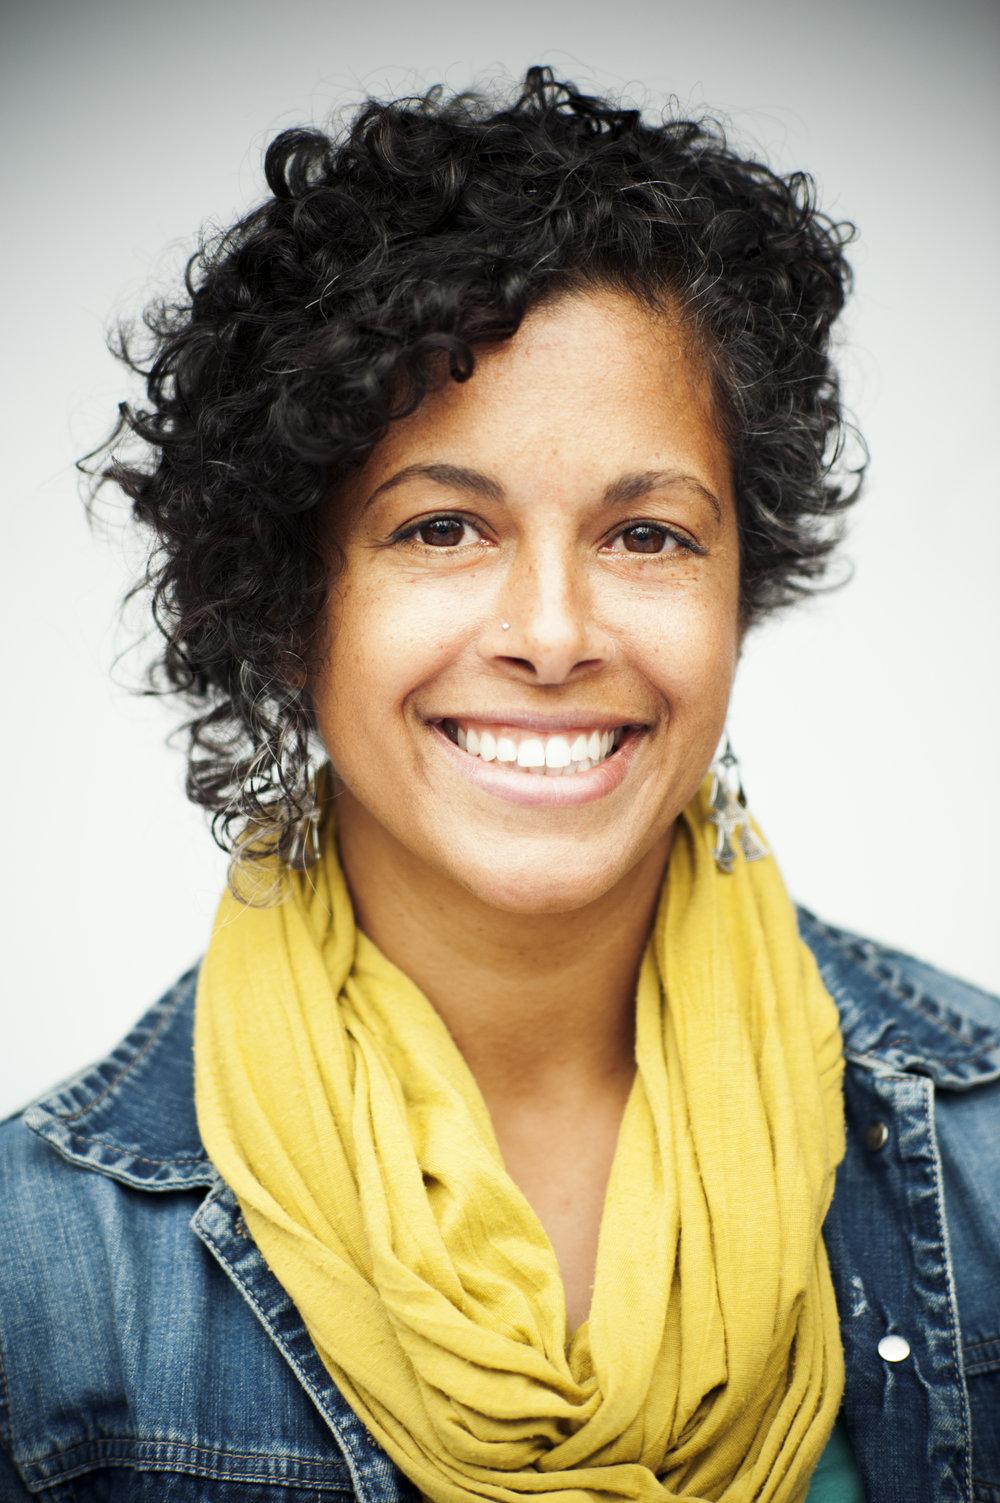 Nicolette Richer, founder of Richer Health Consulting & the Richer Health Retreat Centre